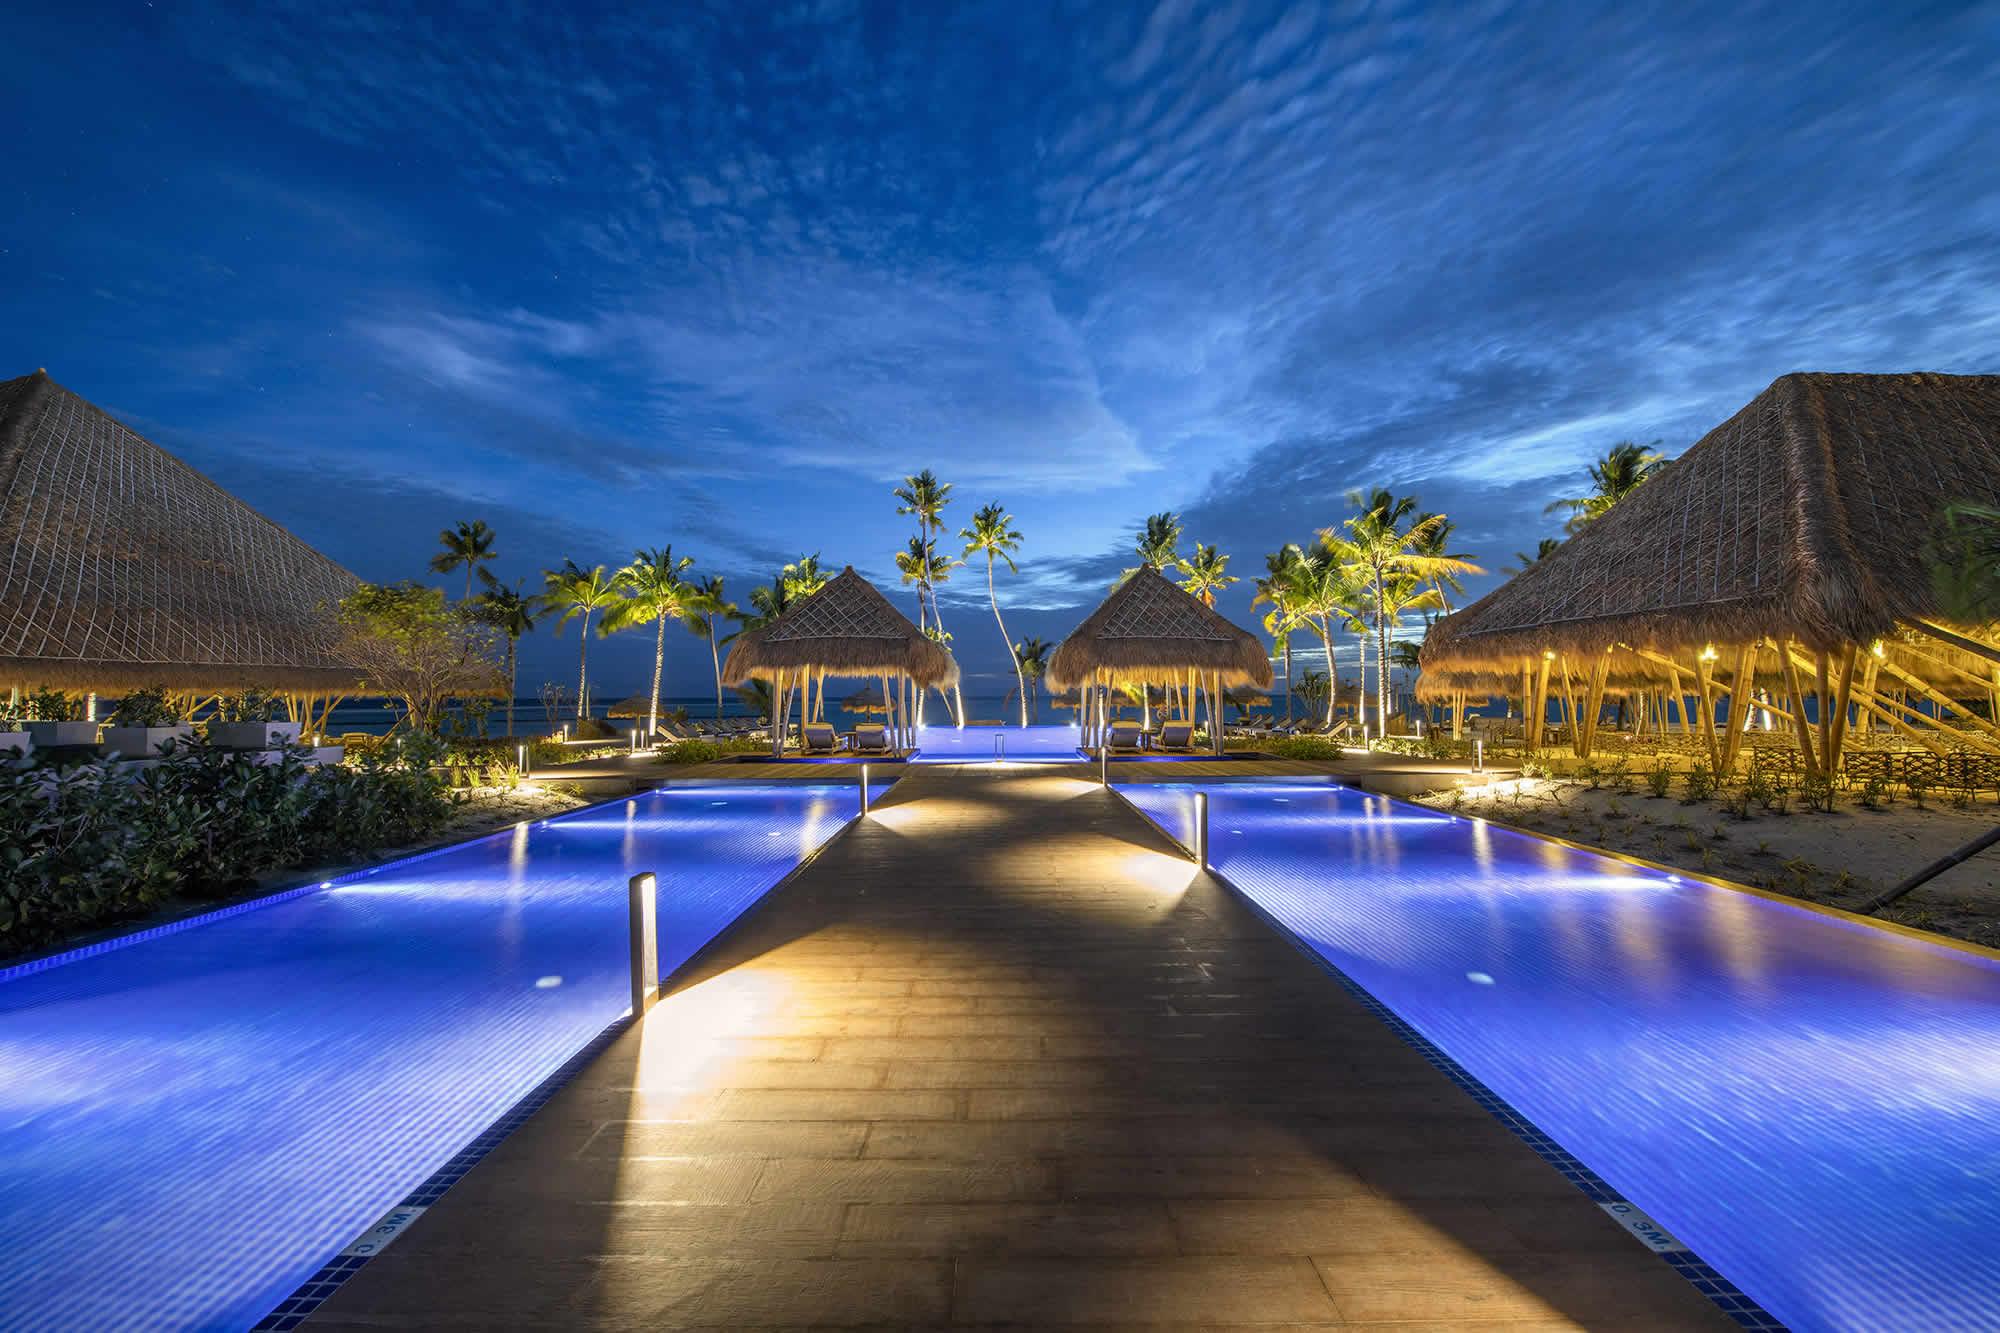 Emerald Maldives Resort & Spa - Maldives Resort